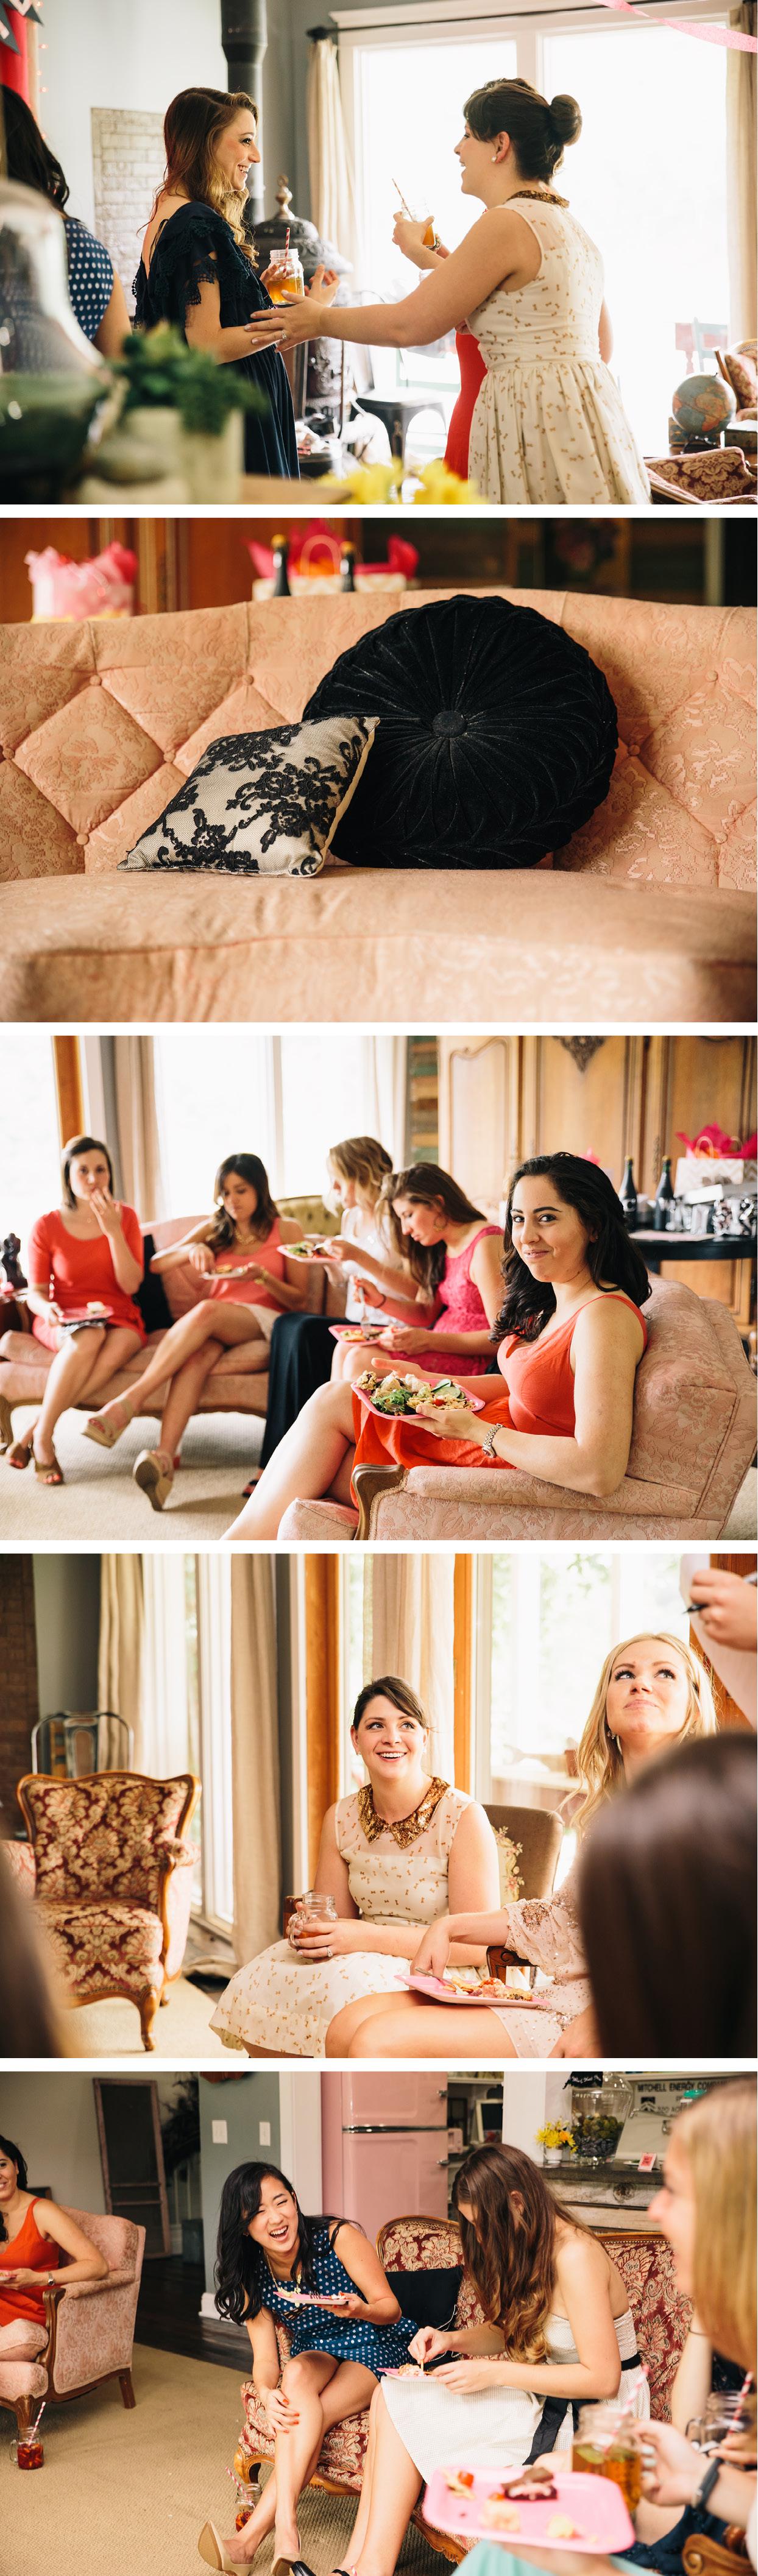 CK-Photo-Nashville-Wedding-Lifestyle-Photographer-cw4.jpg